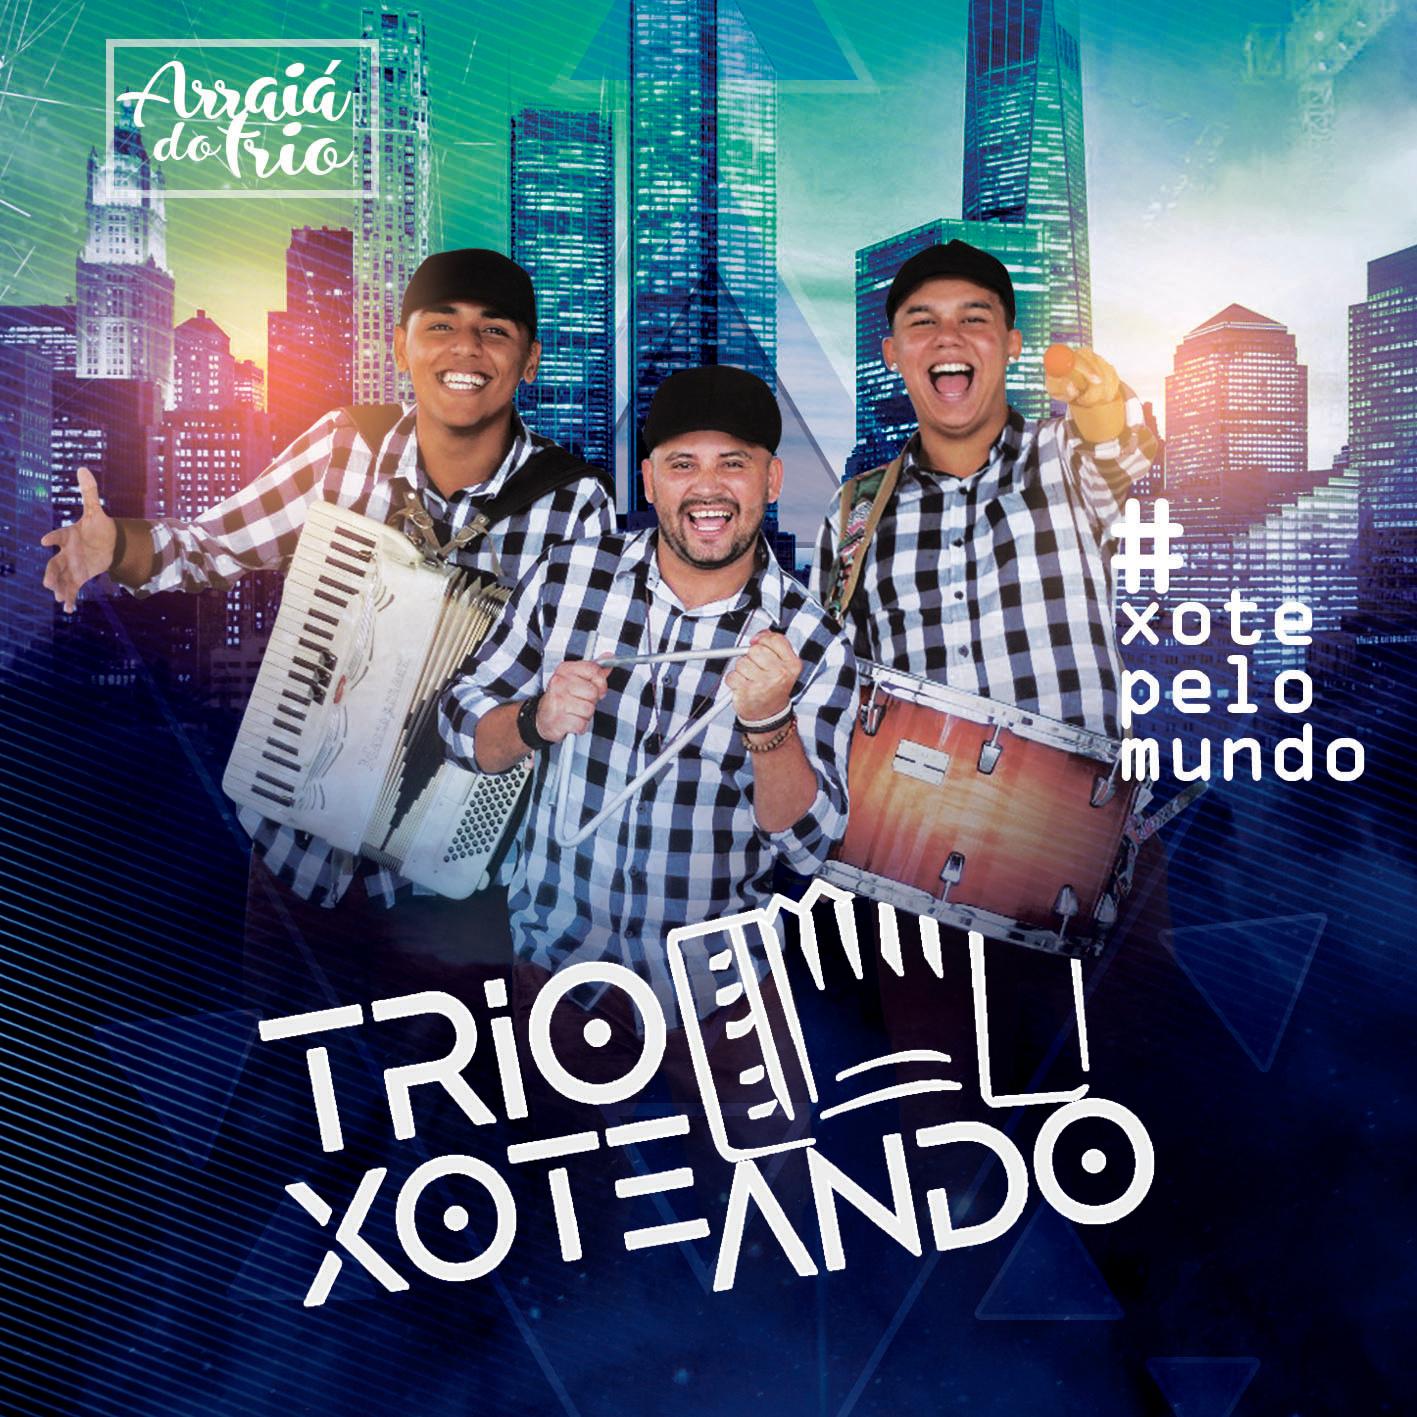 CAPA CD TRIO XOTEANDO FRENTE